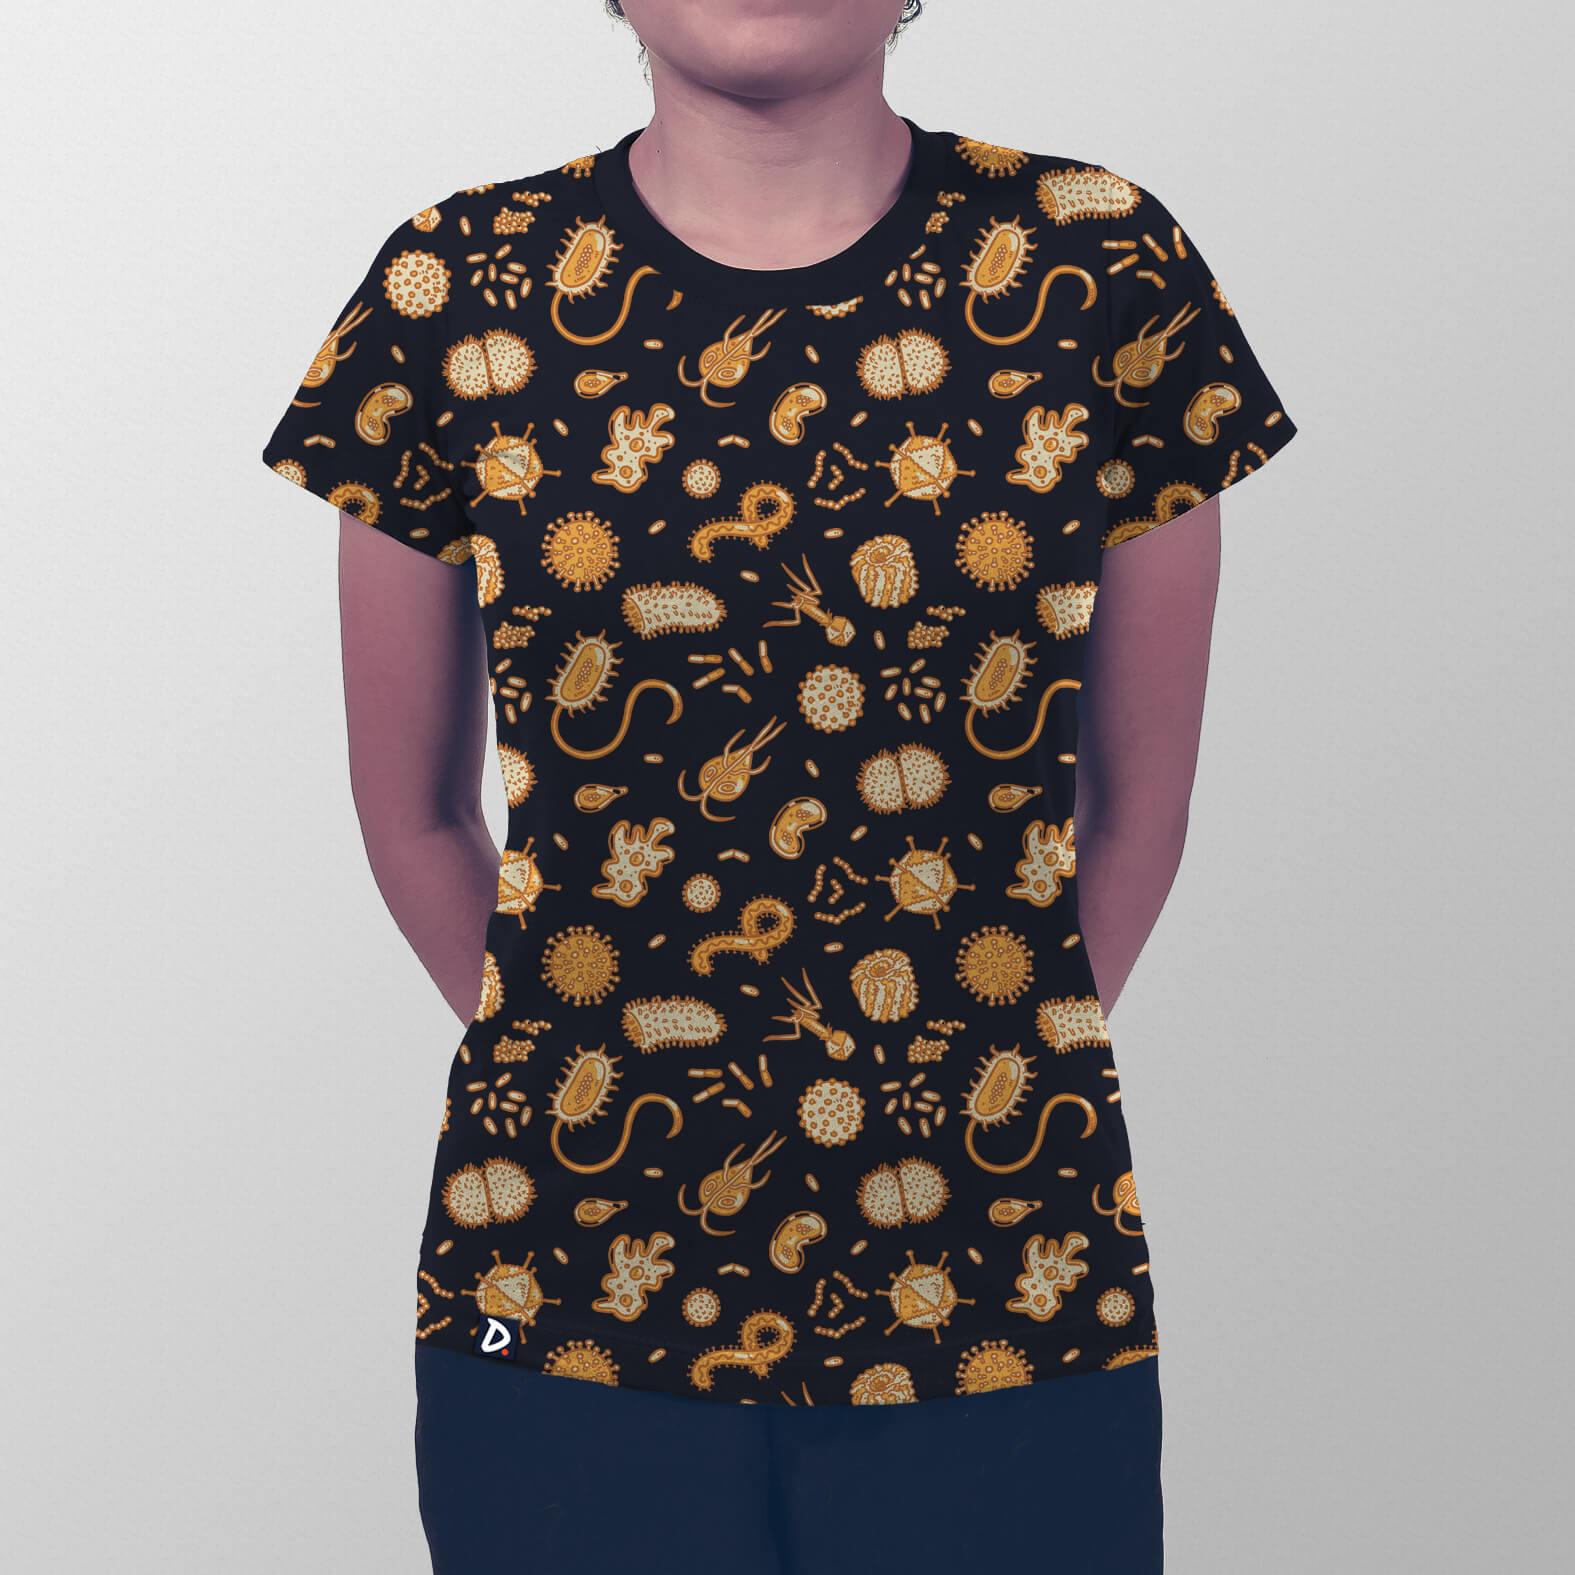 Camiseta Total Microbiologia